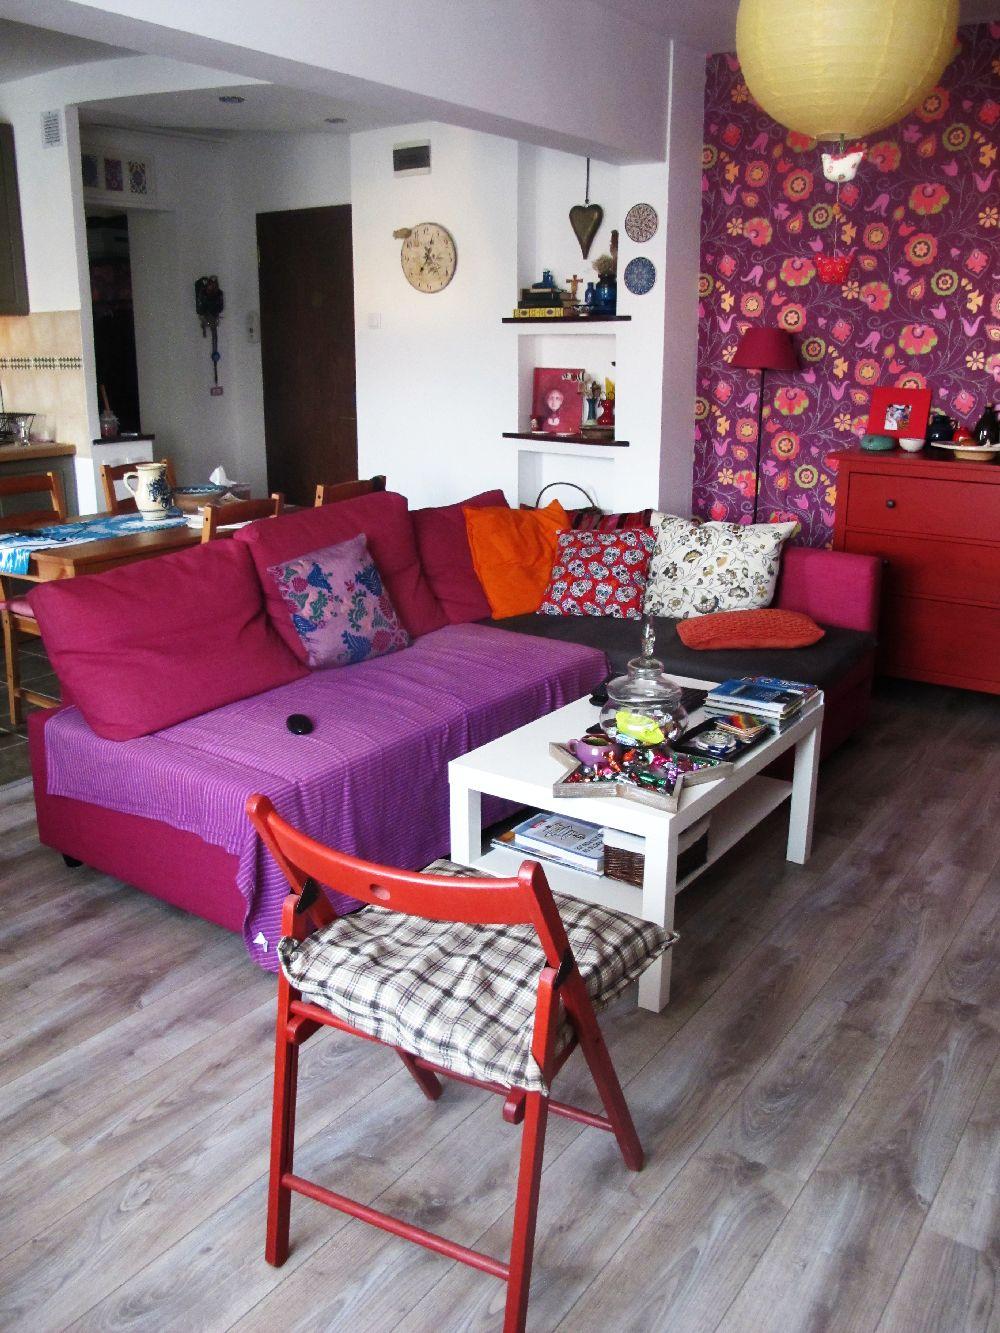 adelaparvu.com despre apartament 3 camere colorat in Sibiu, Foto Adela Parvu (61)